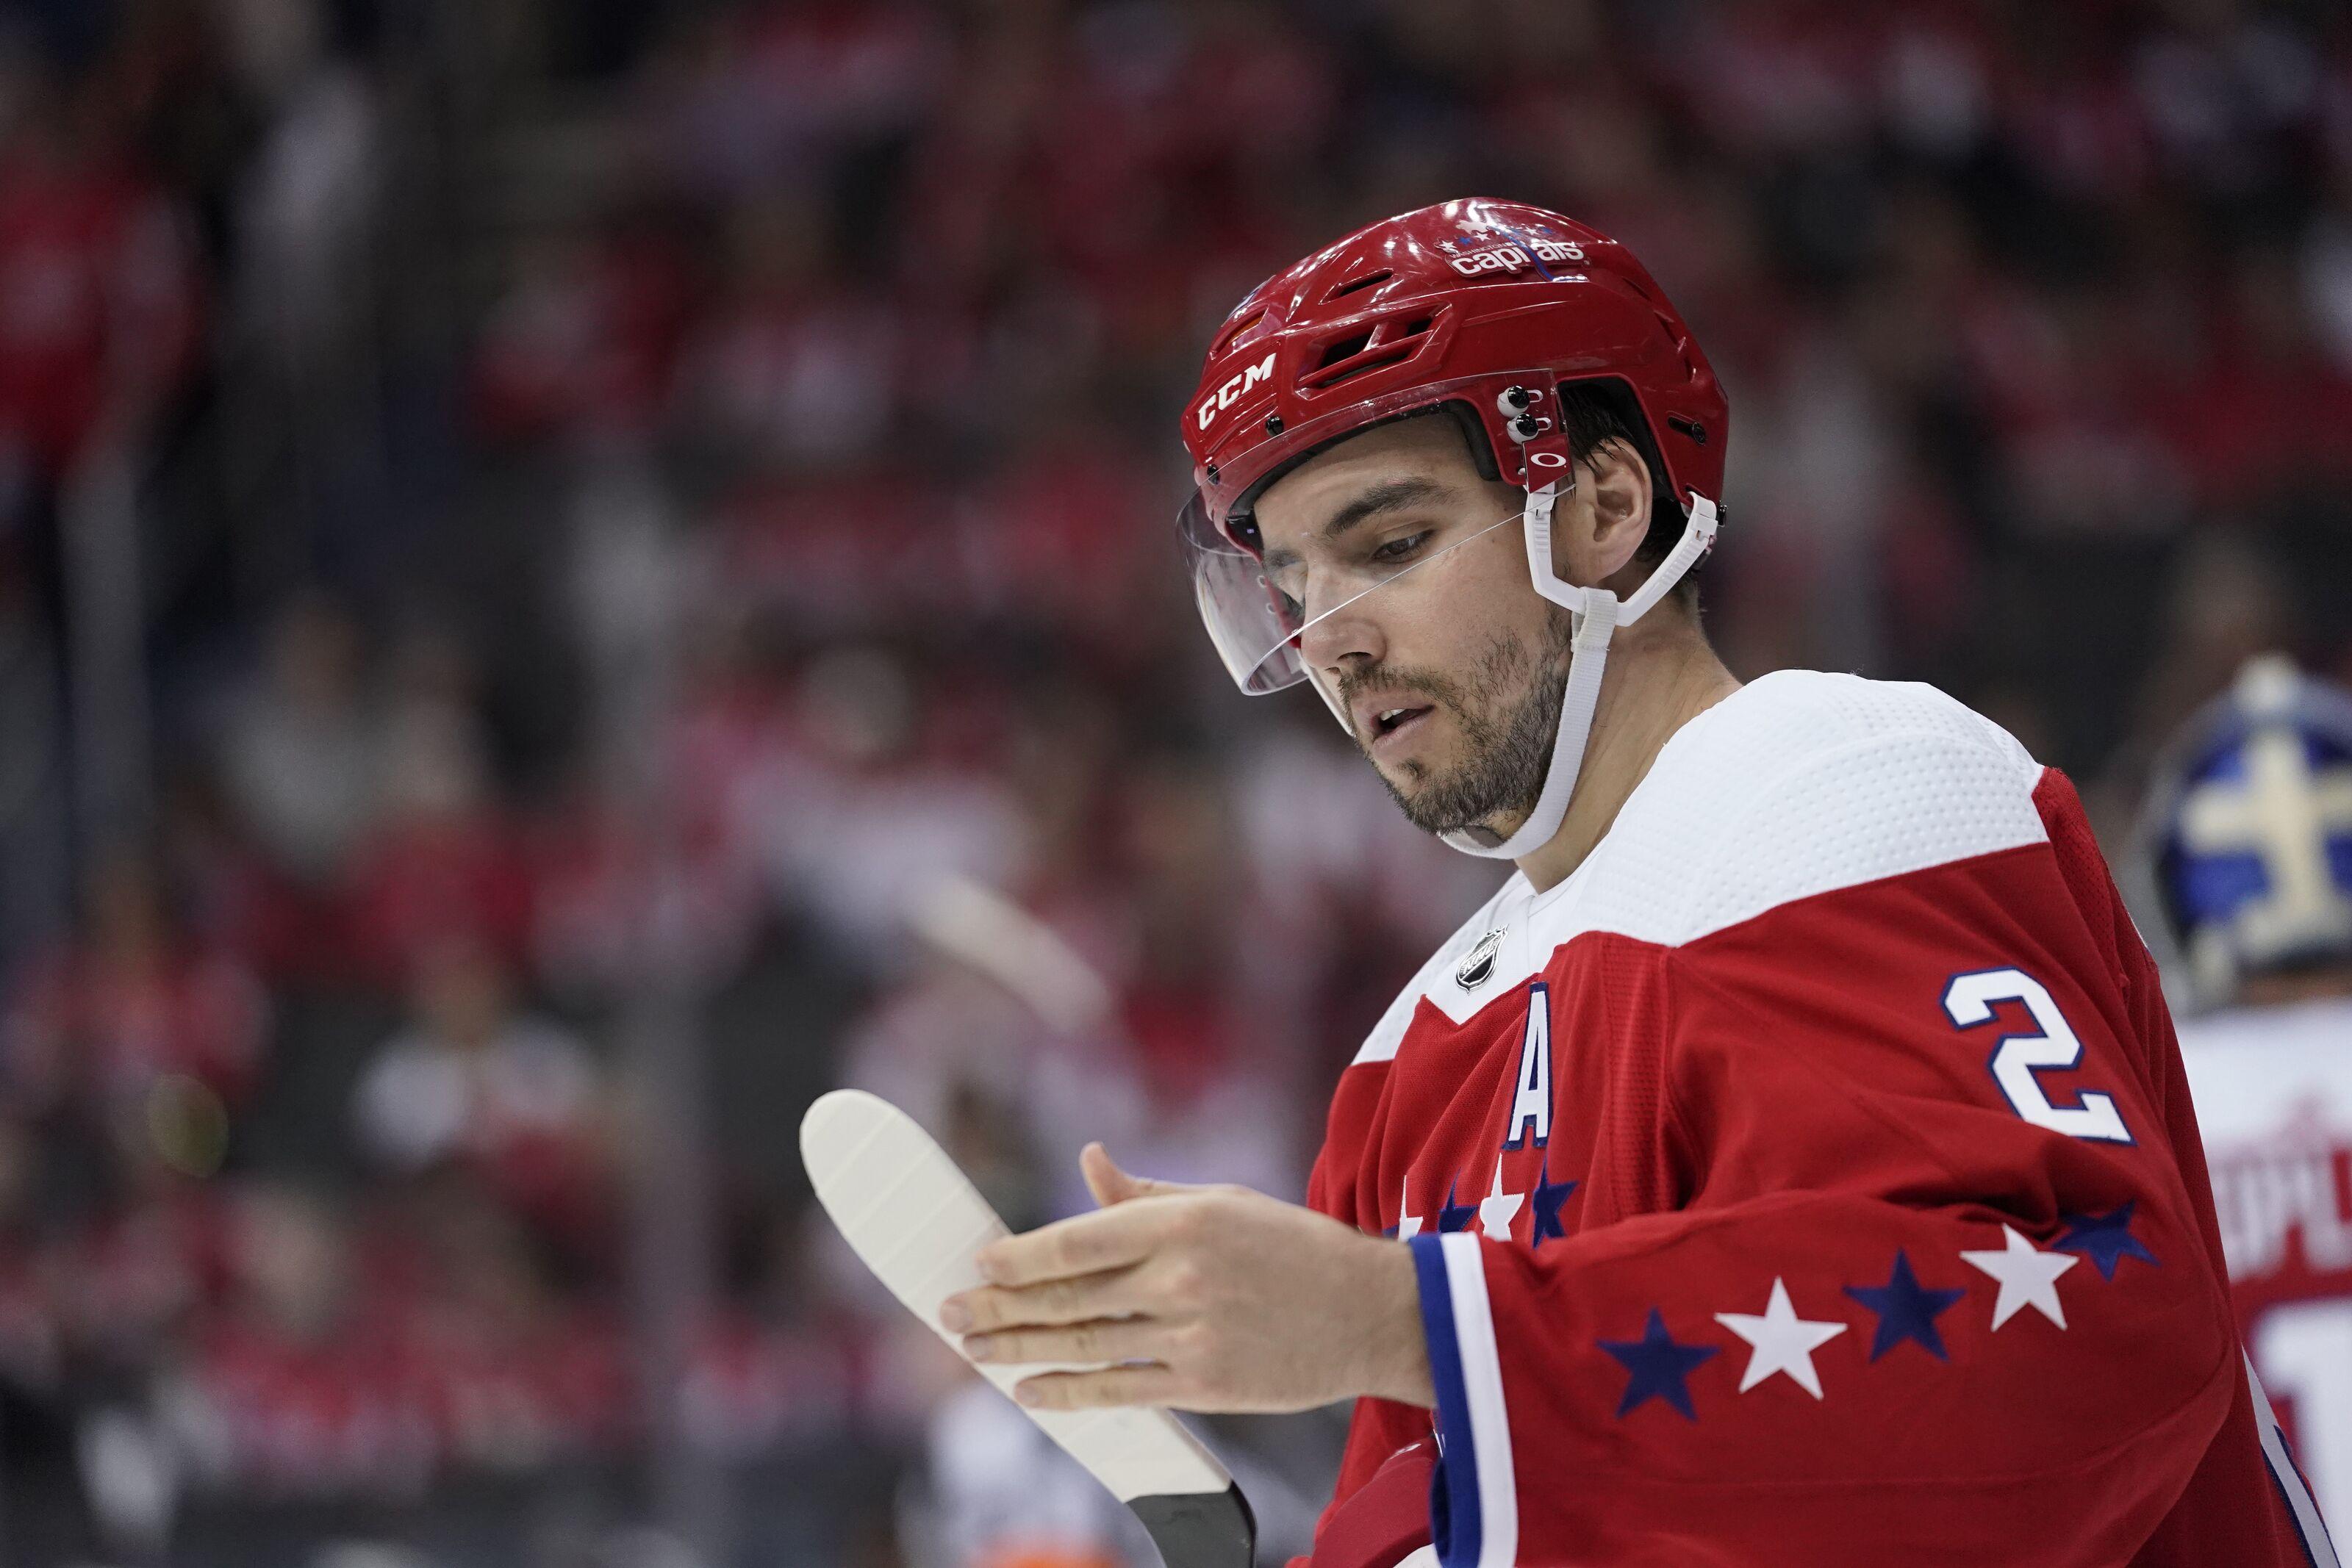 Philadelphia Flyers 2019-20 Player Expectations: Matt Niskanen